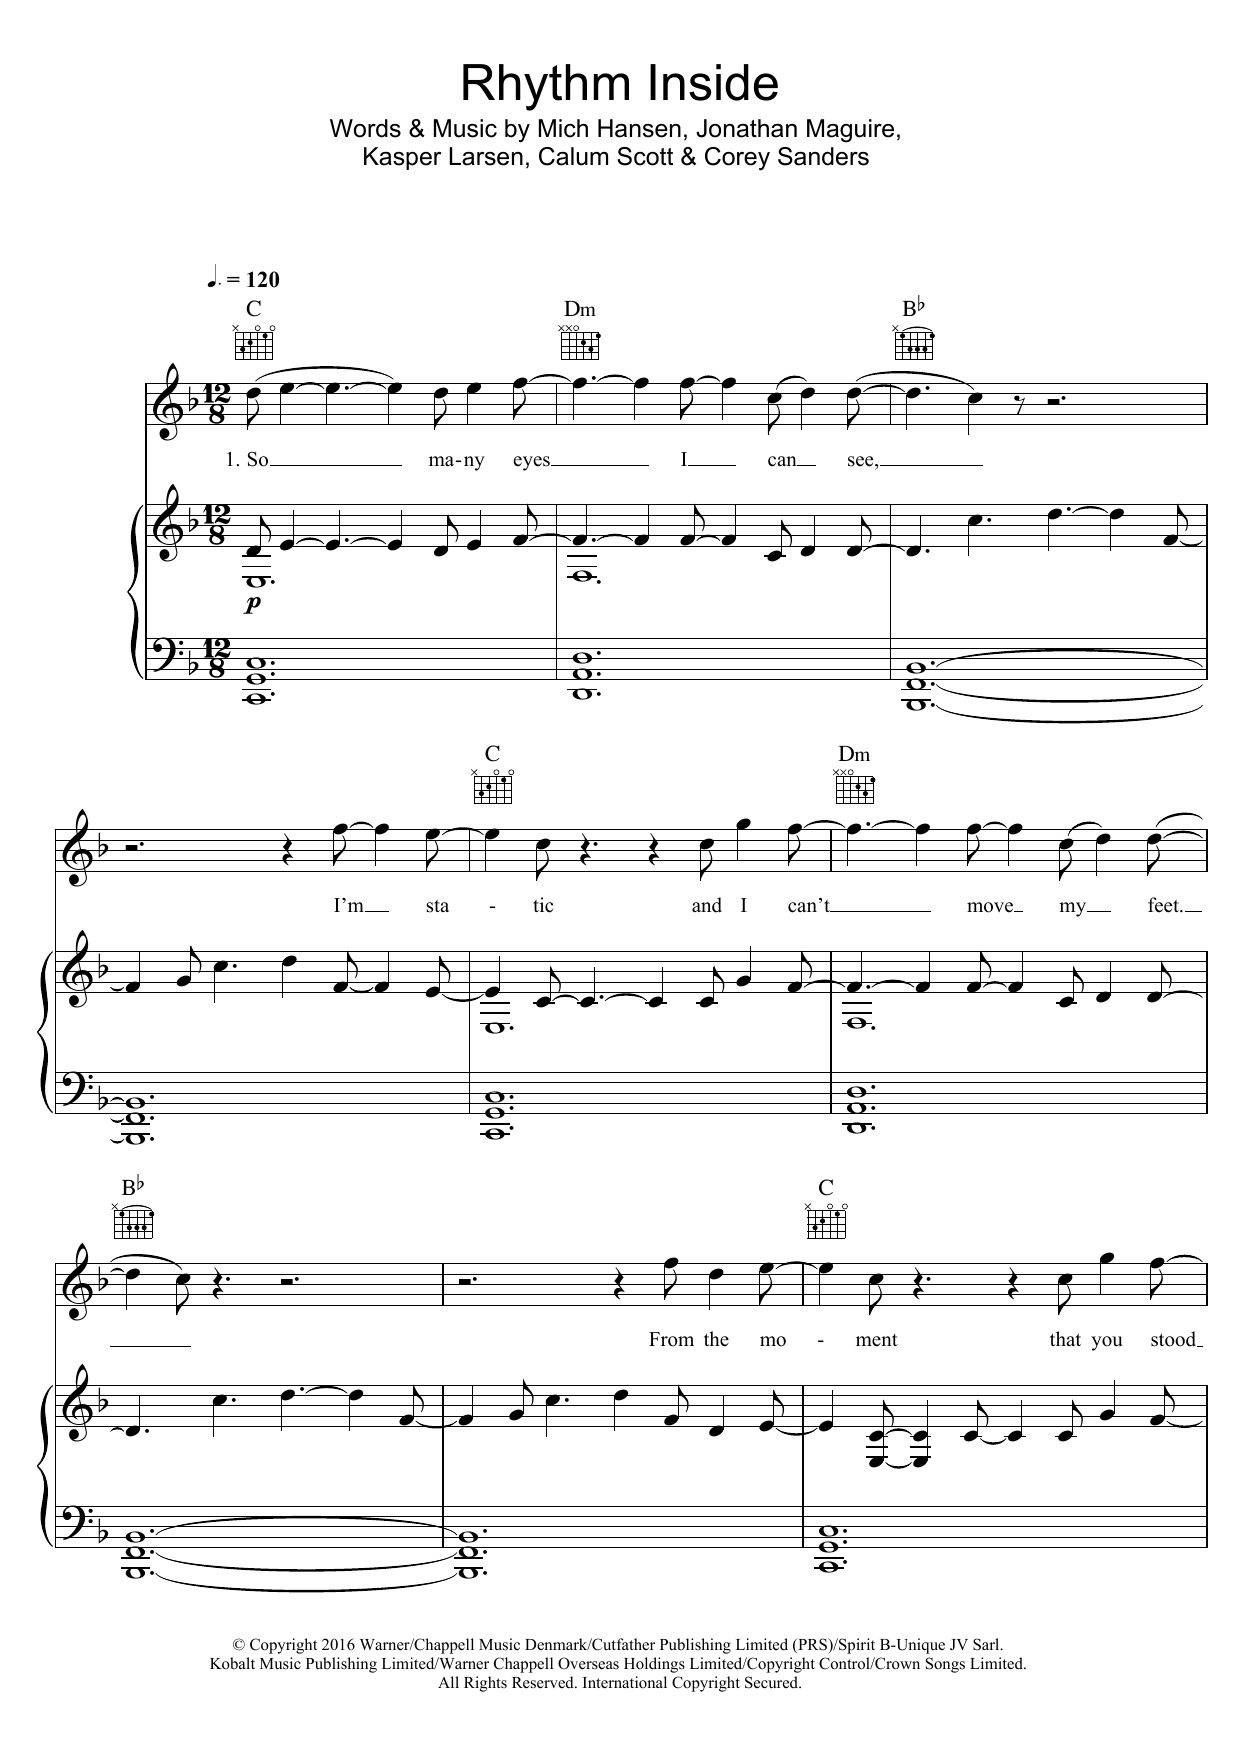 Calum Scott - Rhythm Inside